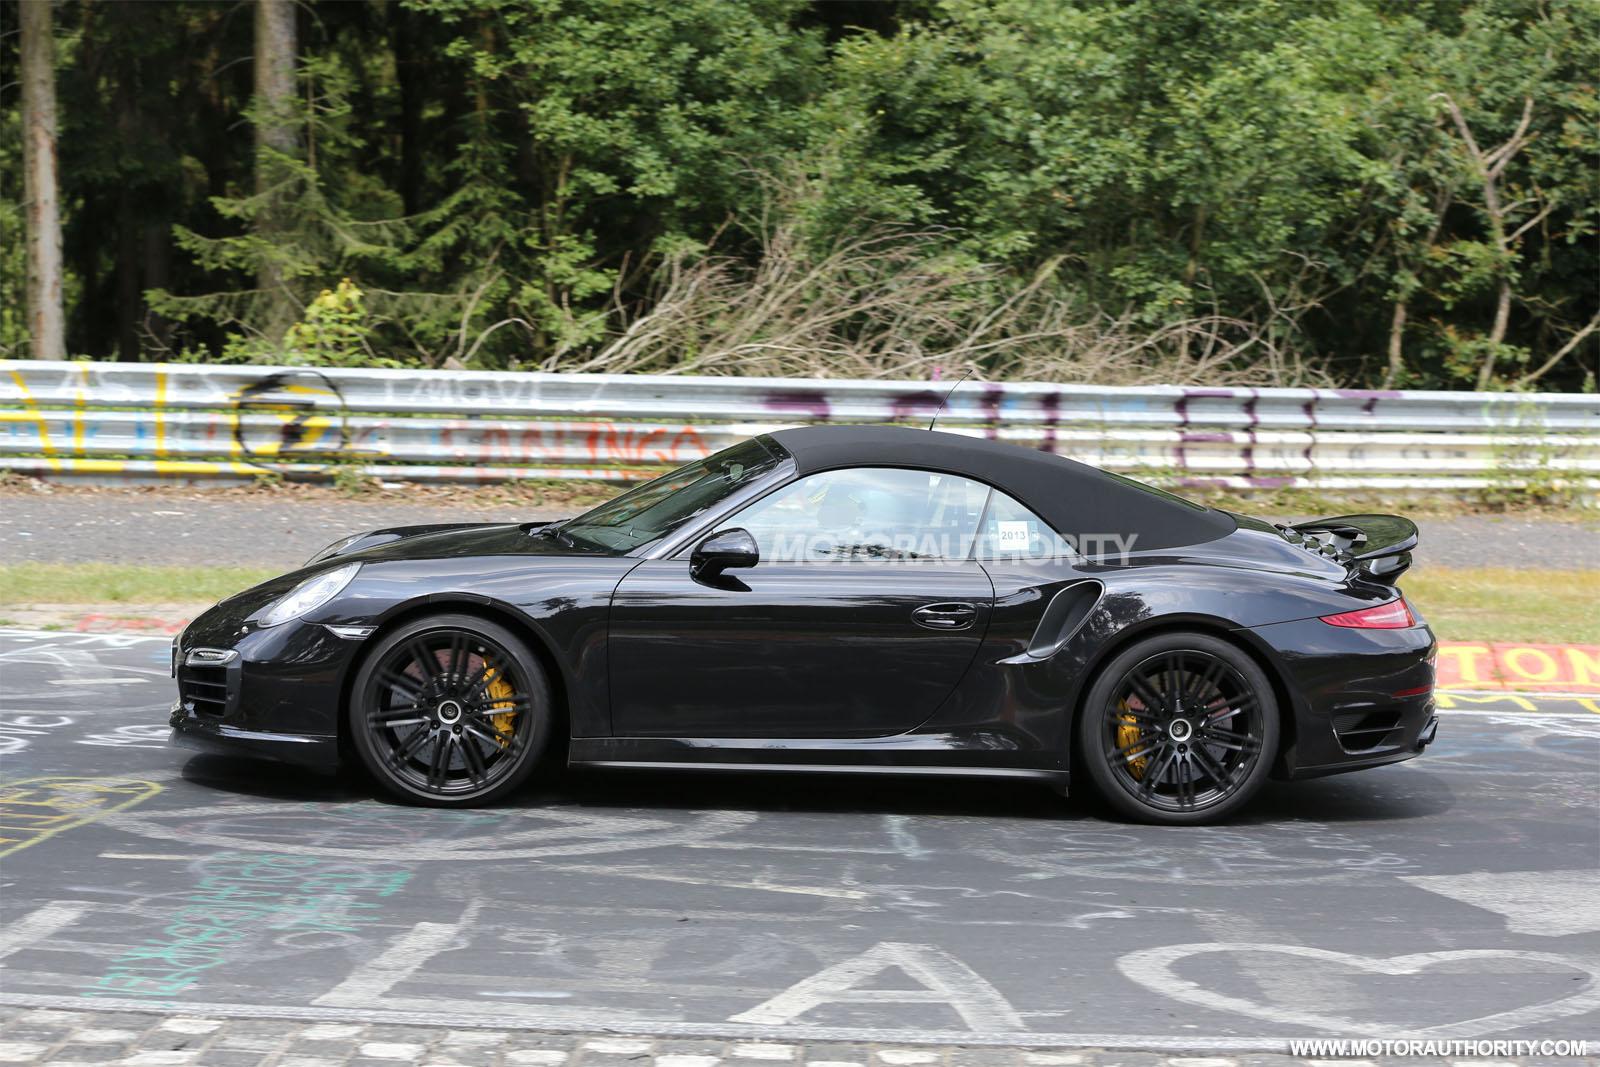 2014 porsche 911 turbo s cabriolet spy shots - Porsche 911 Turbo Black 2000